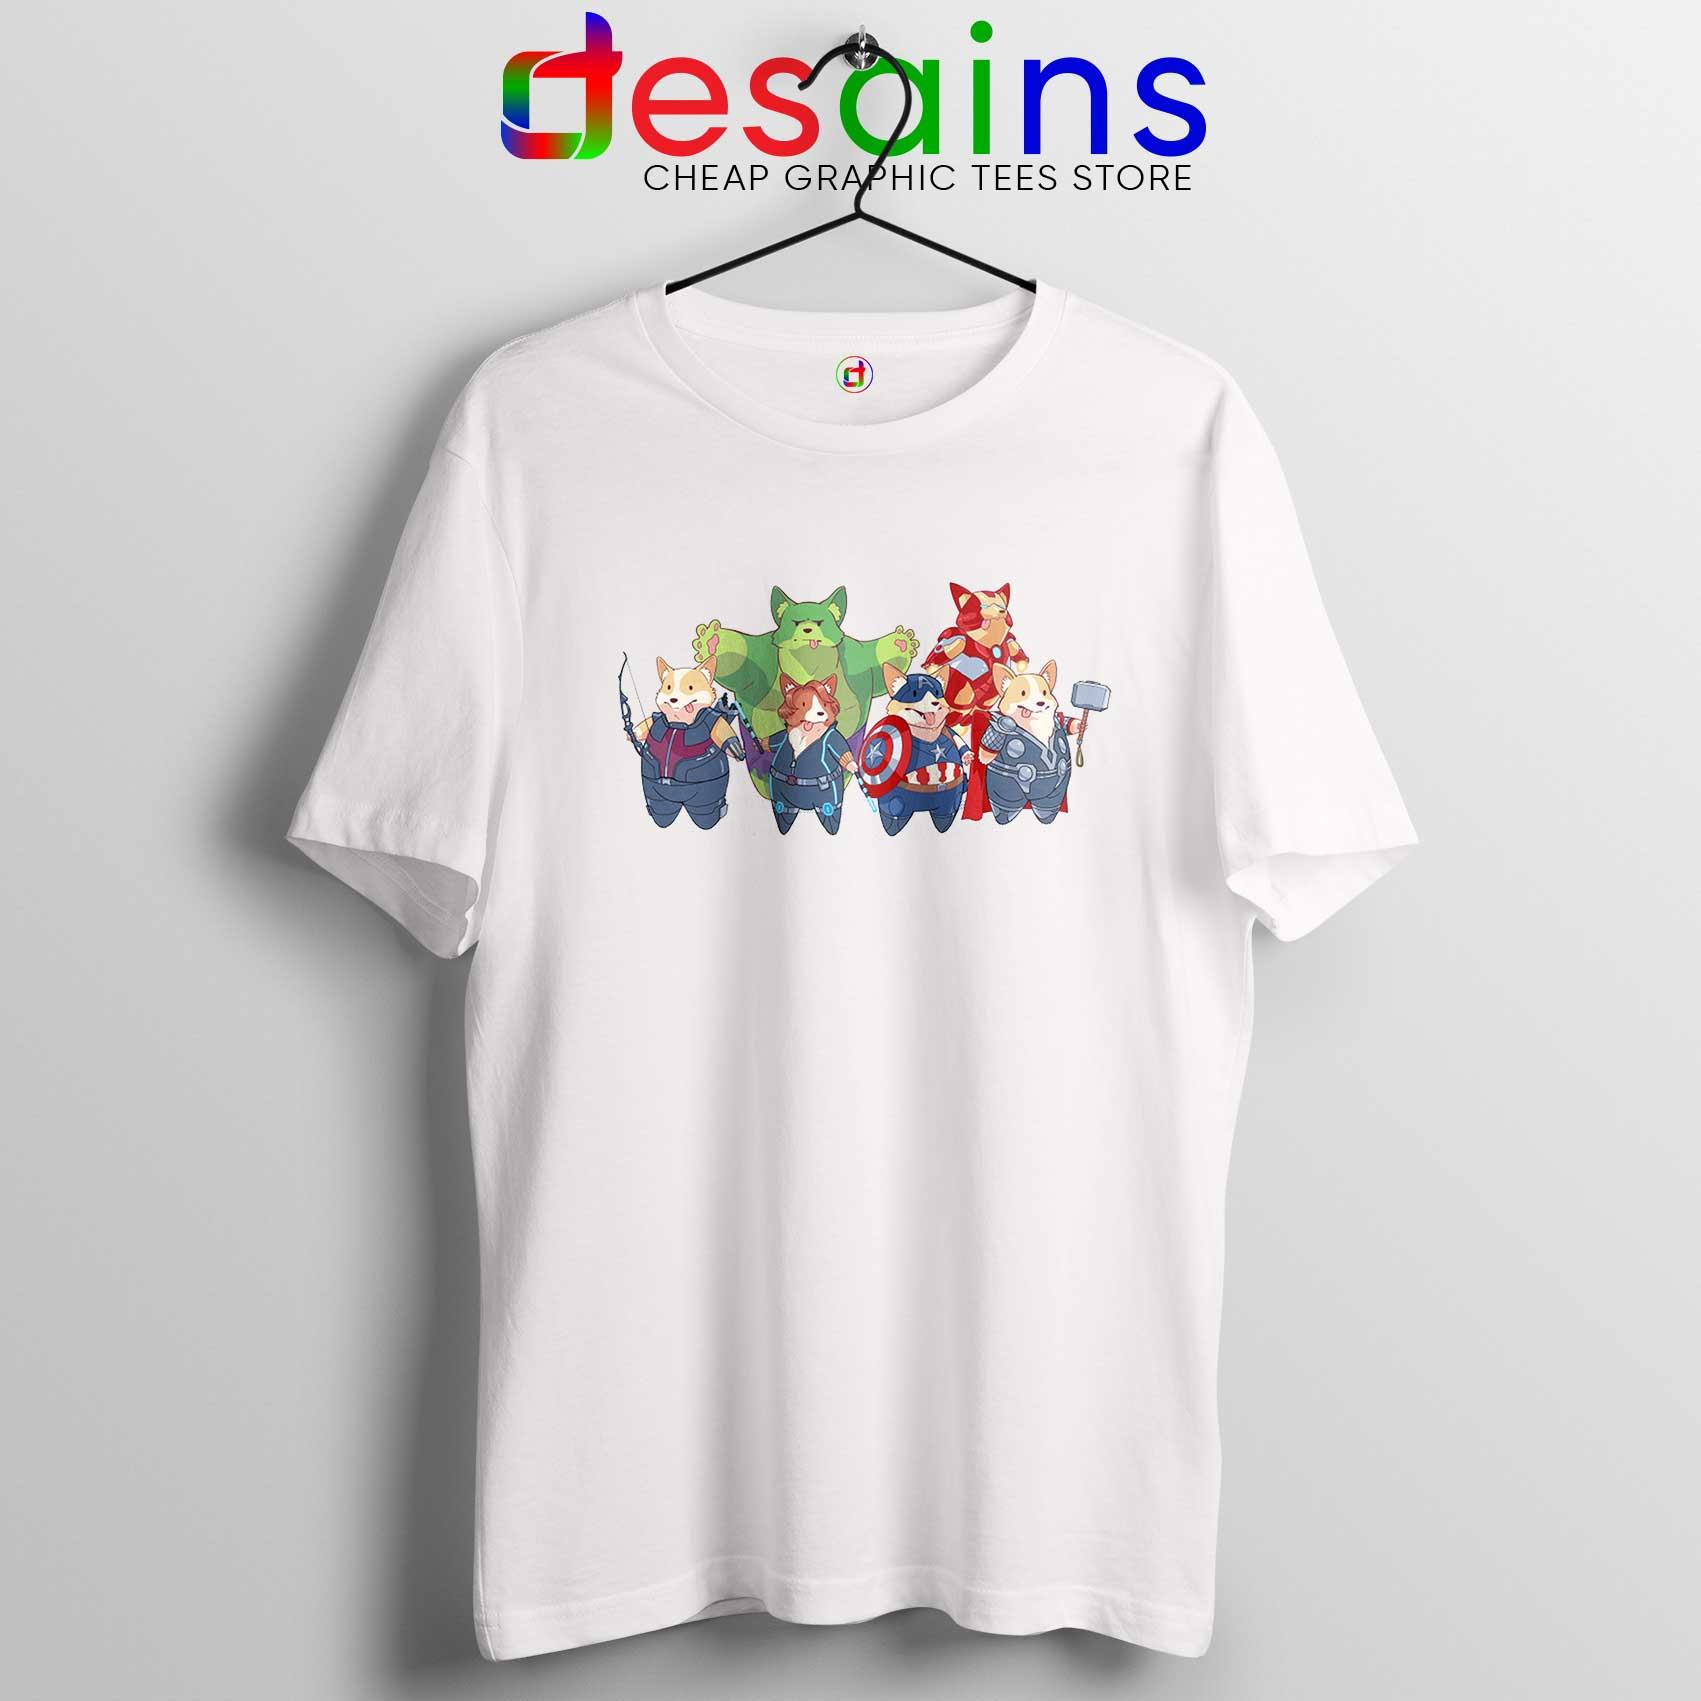 64739688d56ee Tee-Shirt-The-Corgi-Avengers-Endgame-Tshirt-Marvel-Movie.jpg